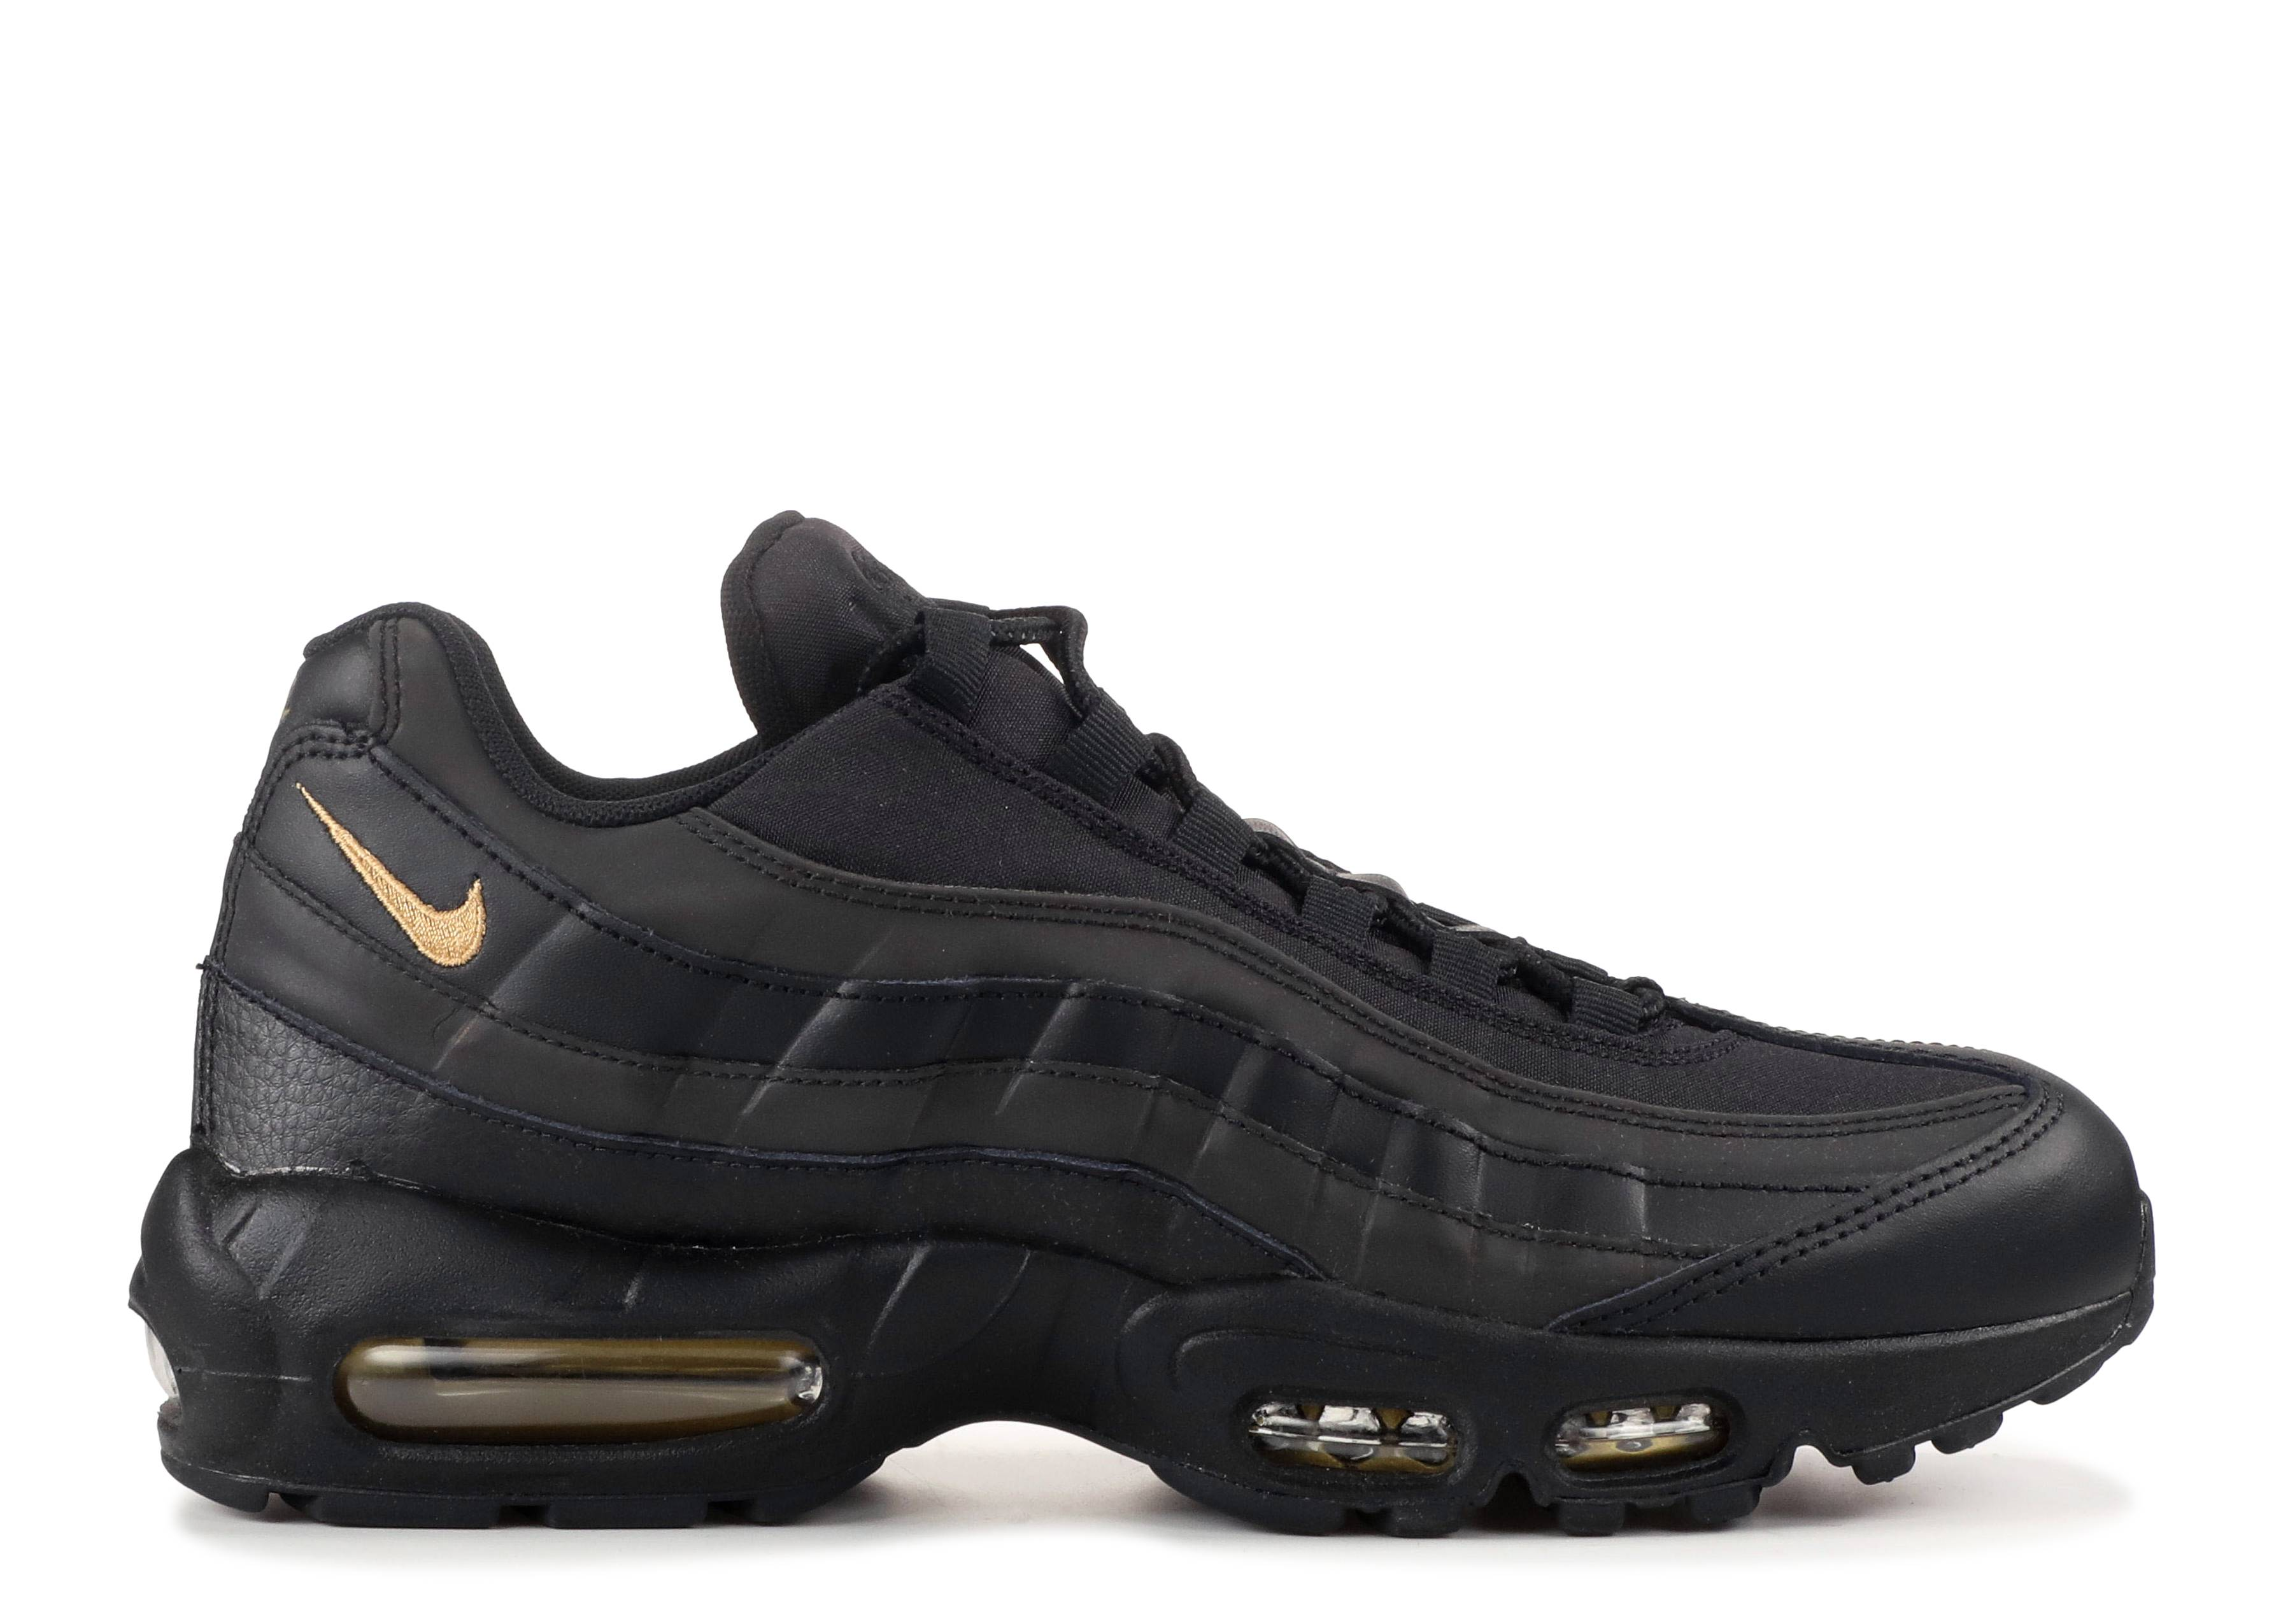 Nike Air Max 95 Premium SE Black Gold 924478 003